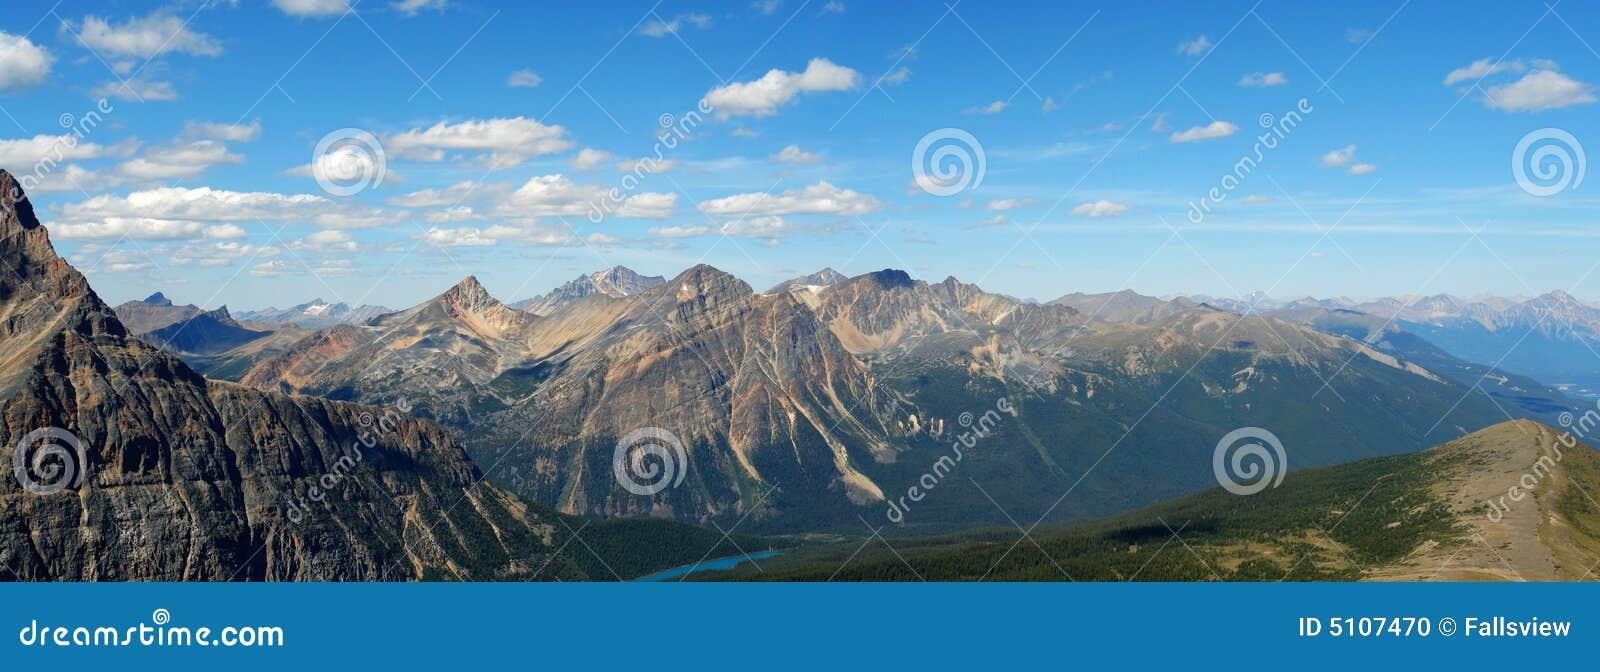 Panorama des montagnes rocheuses